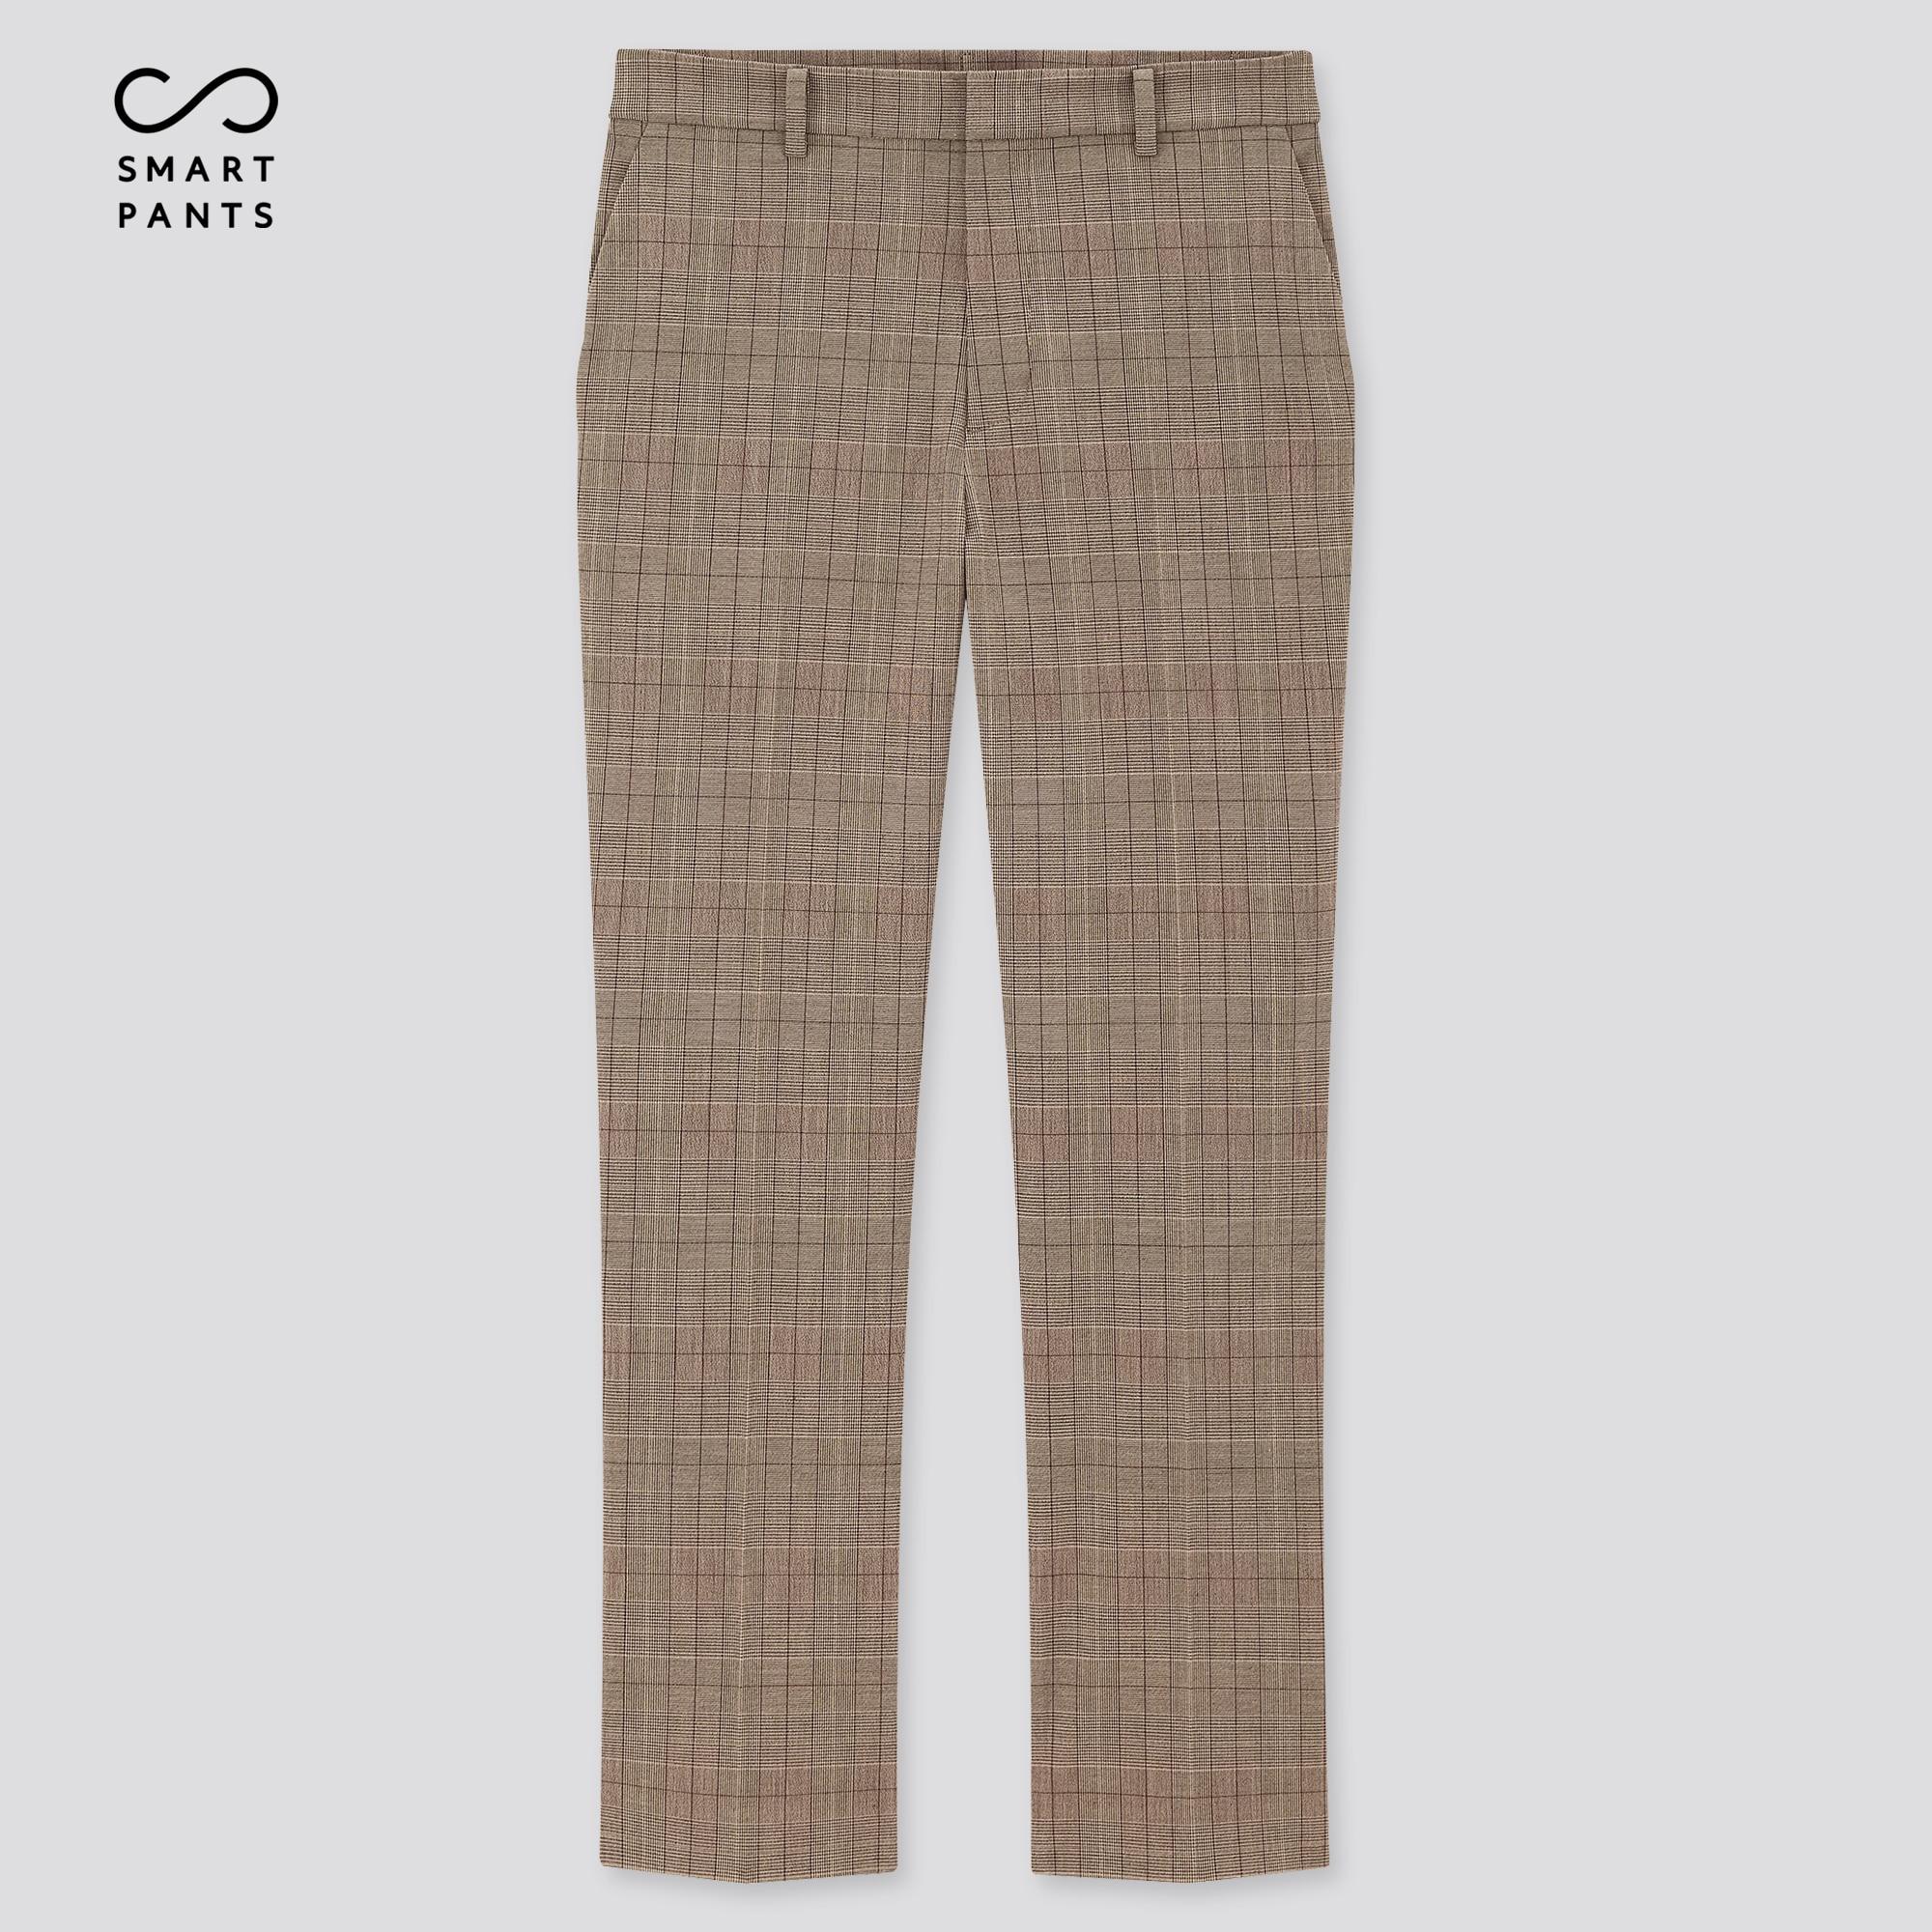 WOMEN SMART 2-WAY STRETCH GLEN PLAID ANKLE-LENGTH PANTS